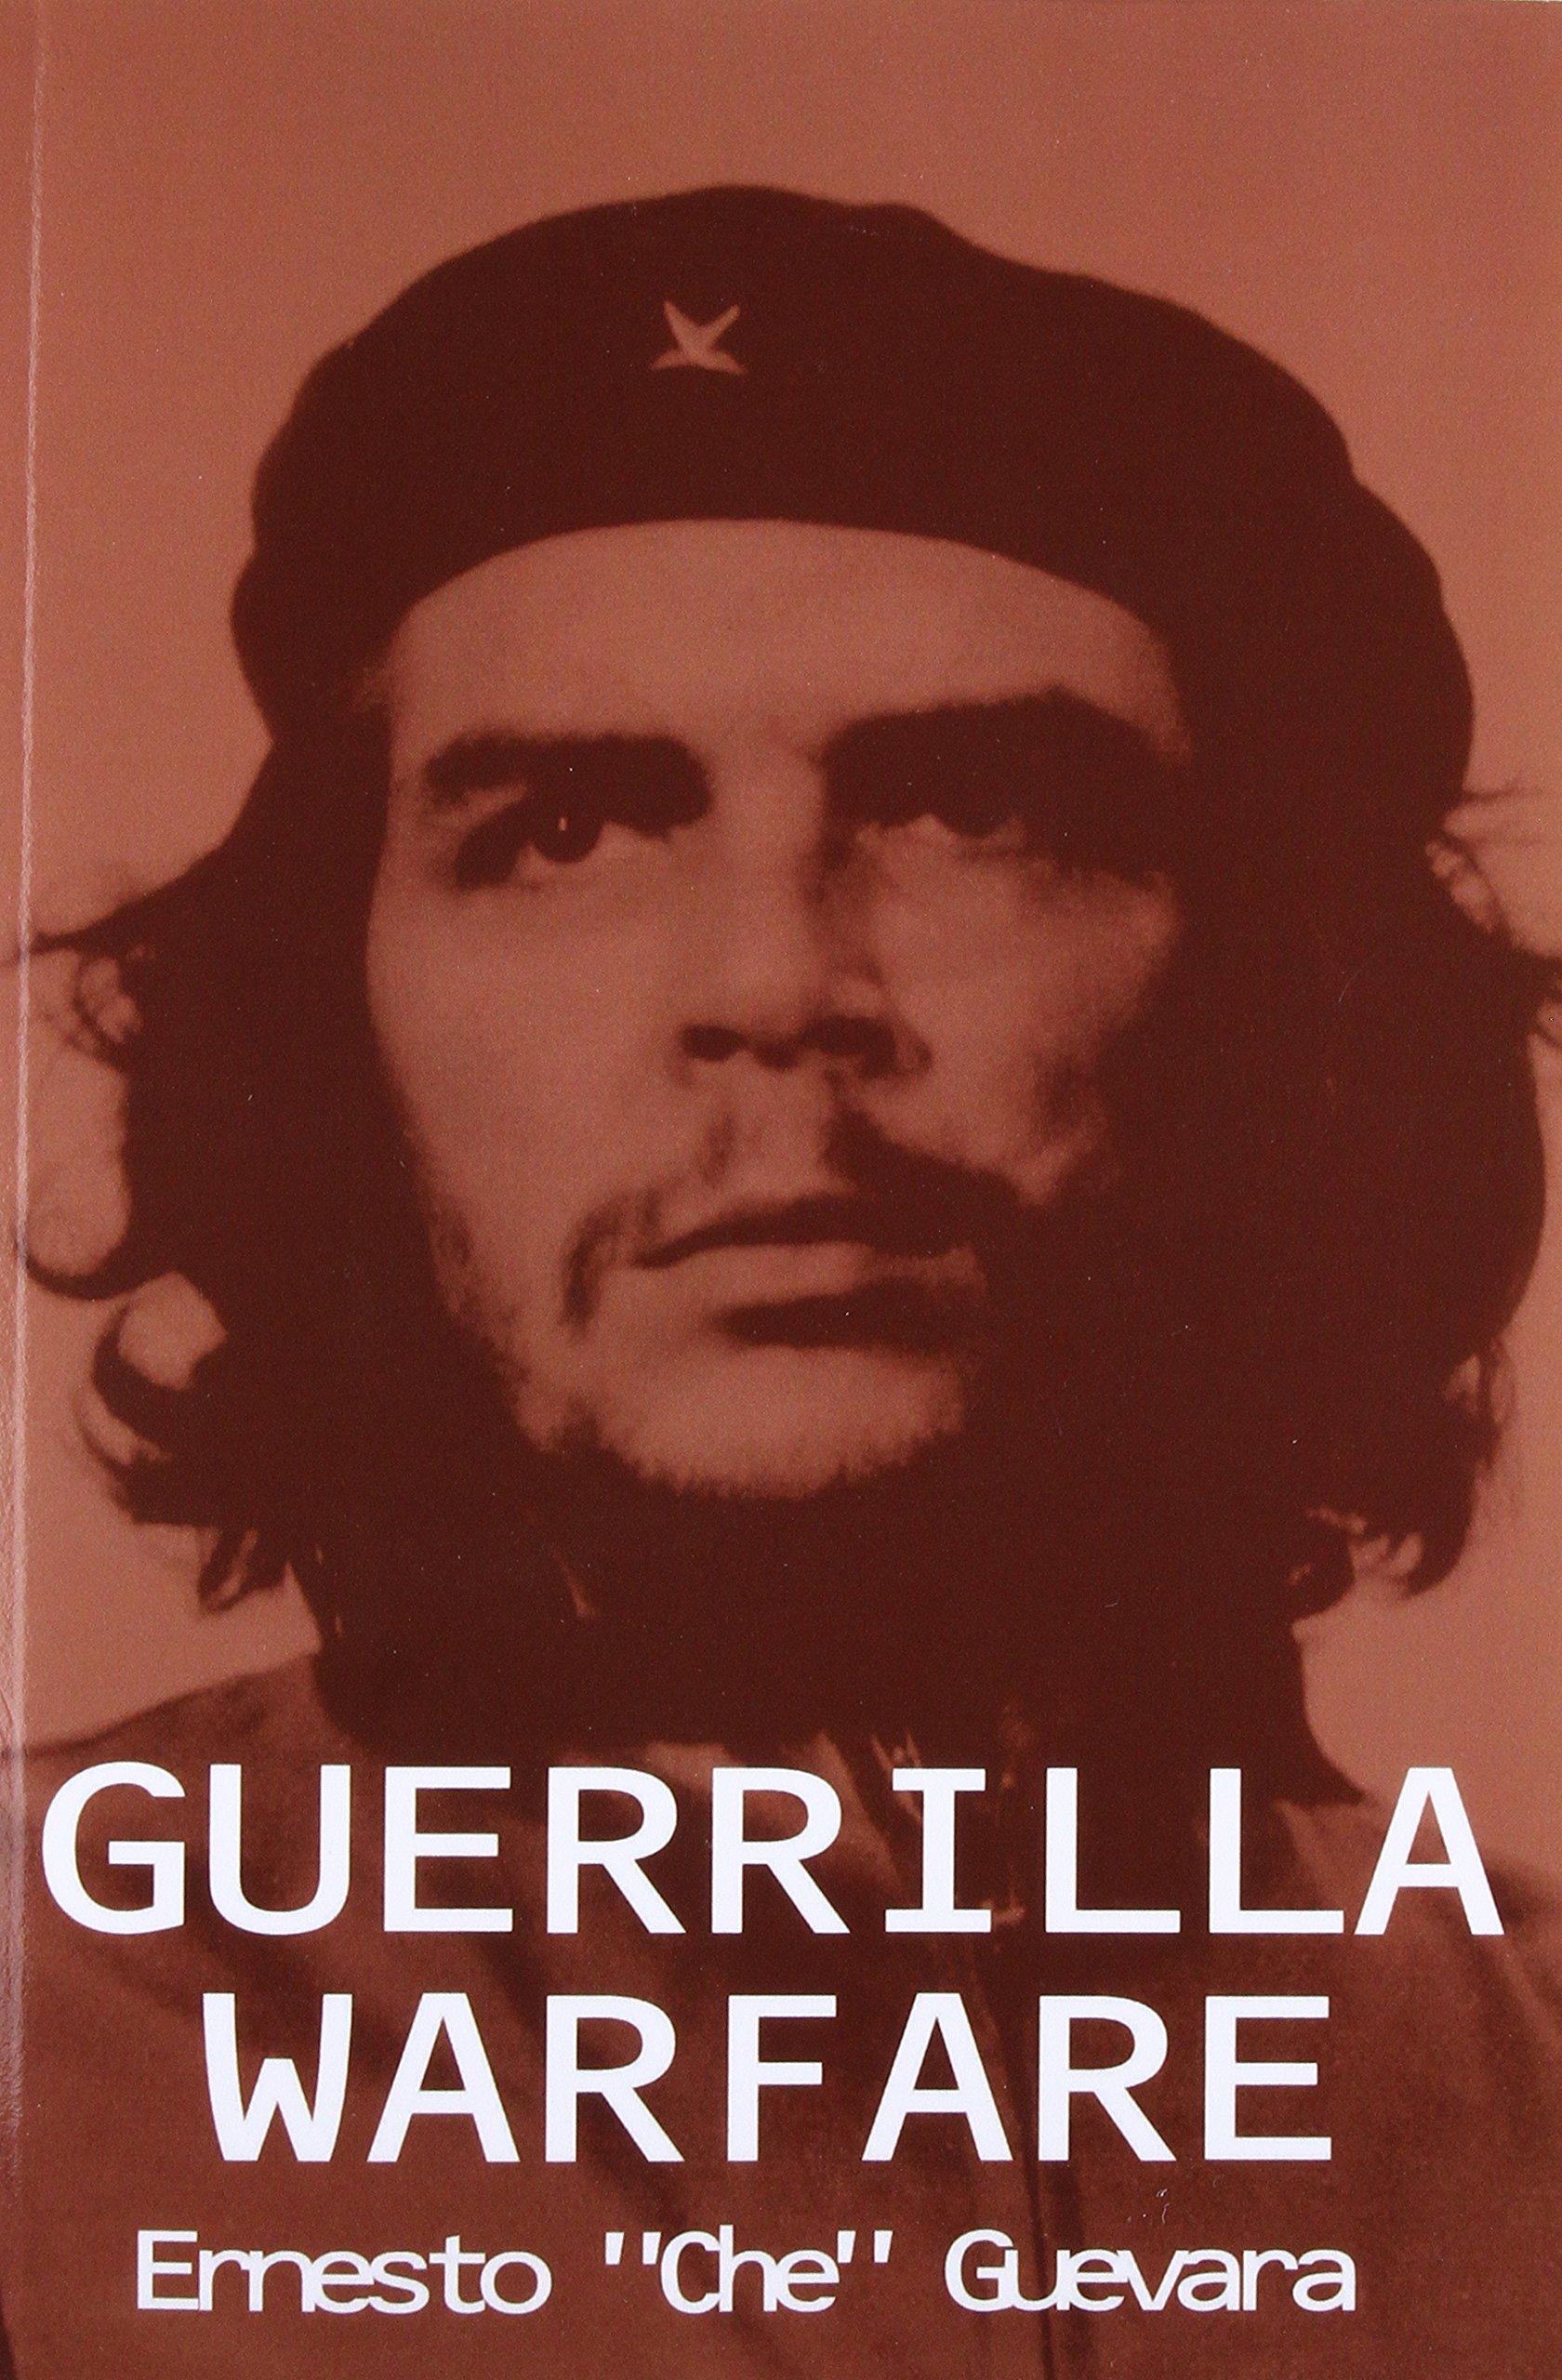 Spanish Essay Help  Essay Different Cultures also Essay Writing On Environment Guerrilla Warfare Amazonde Ernesto Che Guevara Fremdsprachige Bcher Critiquing Qualitative Research Essay